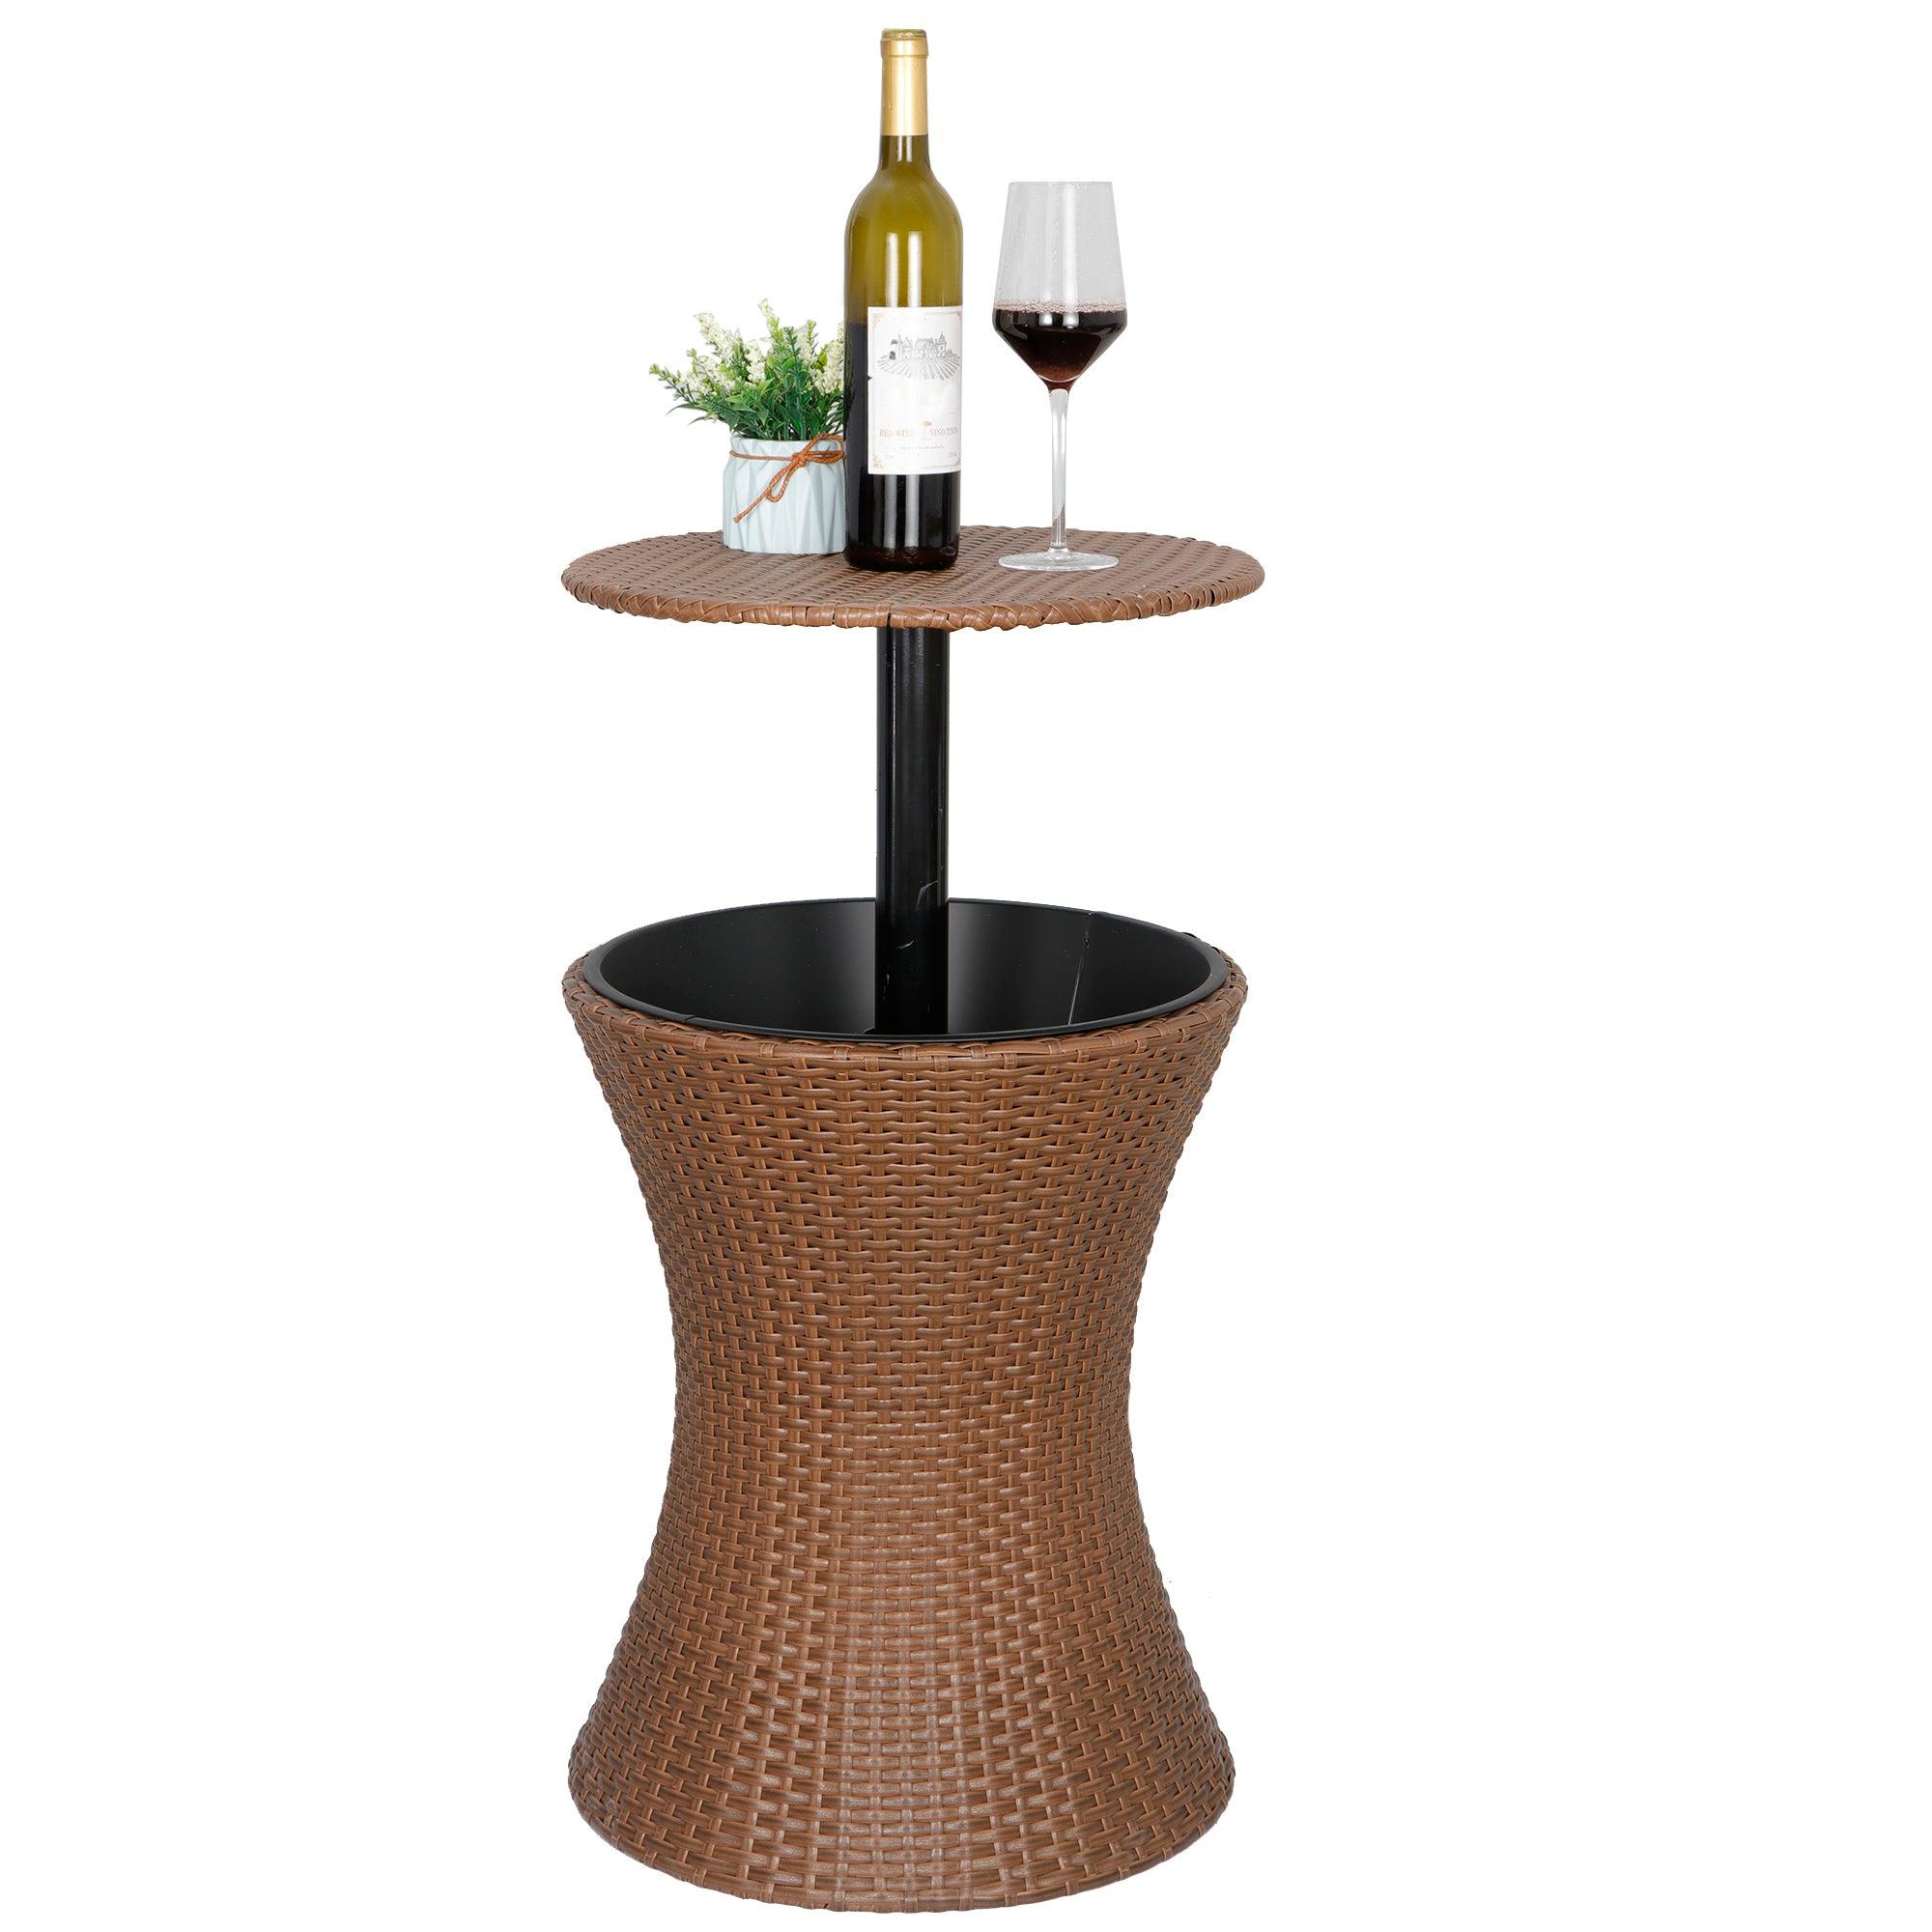 Segawe Wicker Barstools Rattan Cooler Bar Table